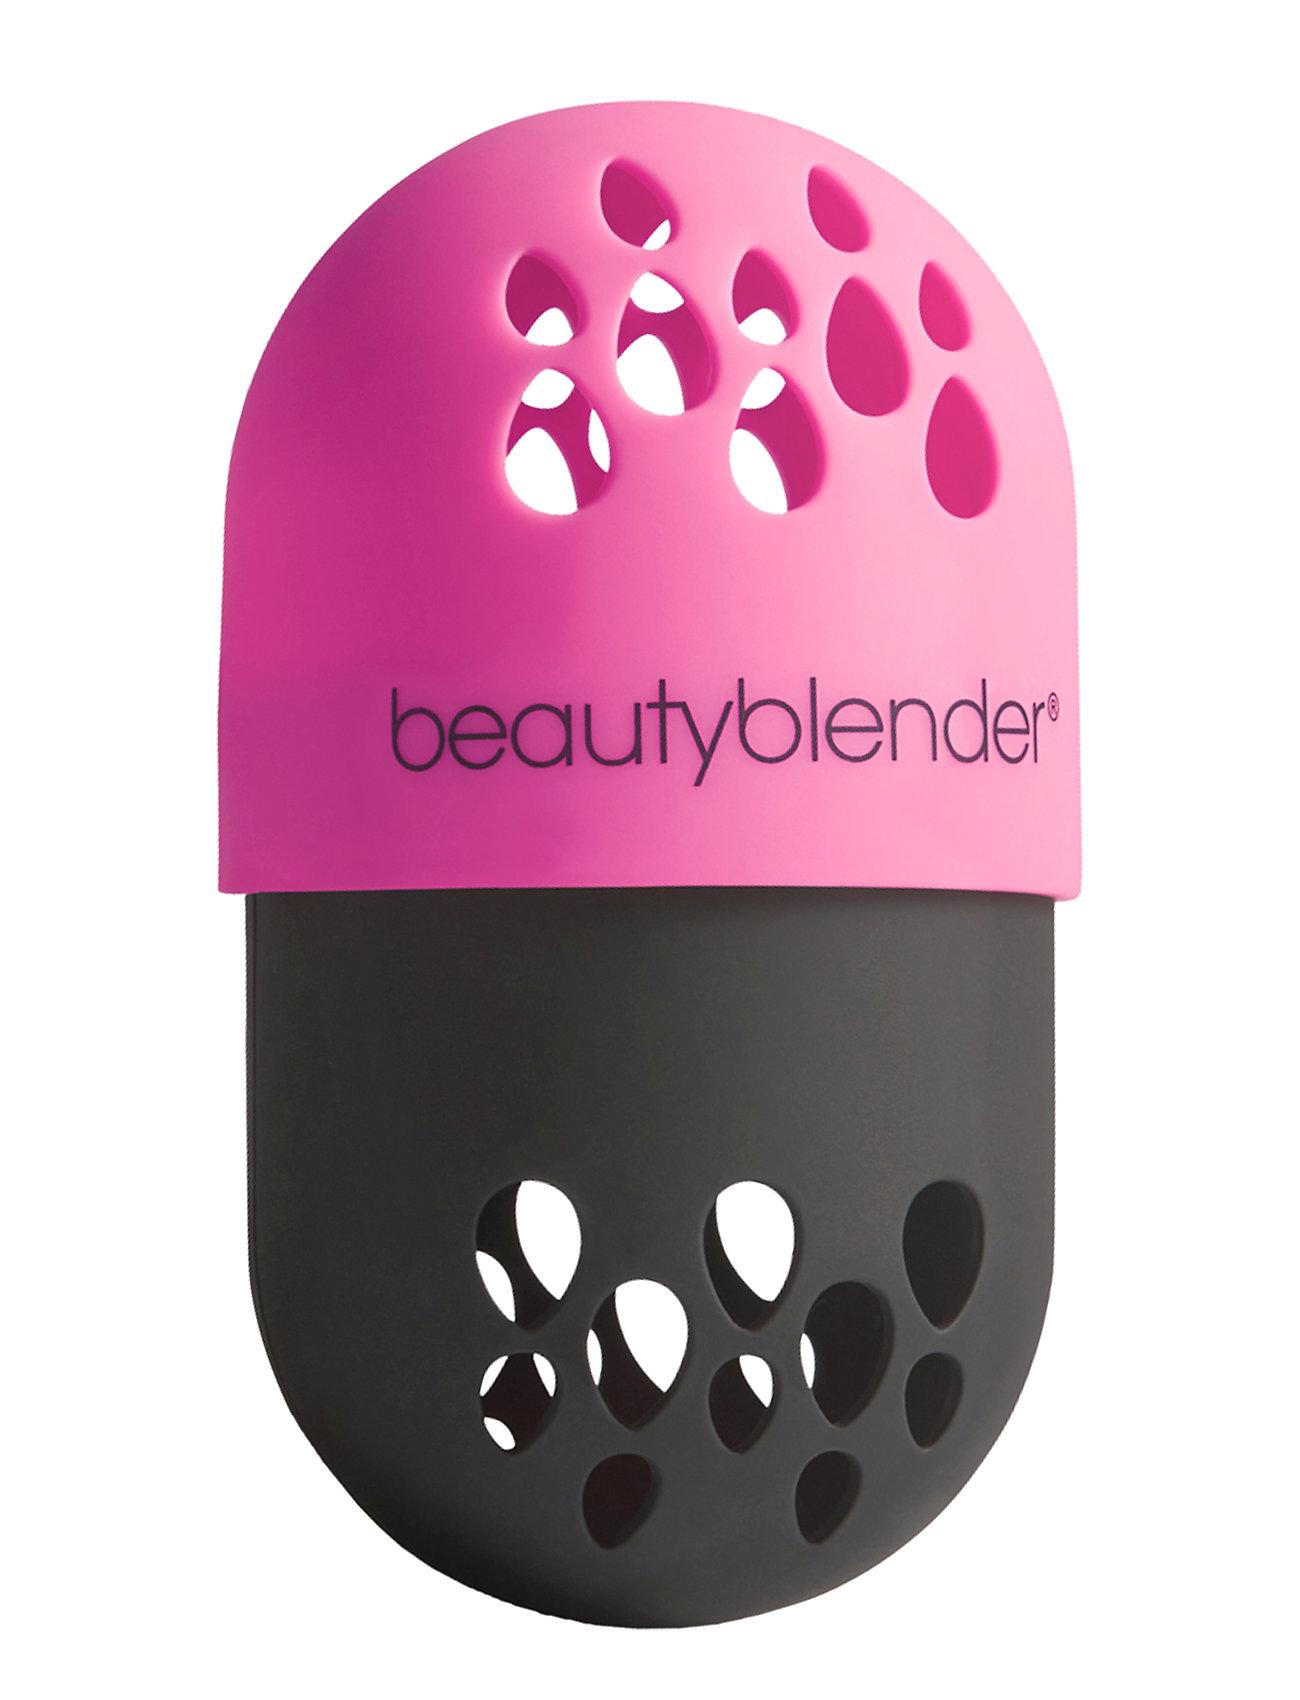 Image of Beautyblender Blender Defender Beauty WOMEN Makeup Makeup Brushes Sponges & Applicators Nude Beautyblender (3439482721)